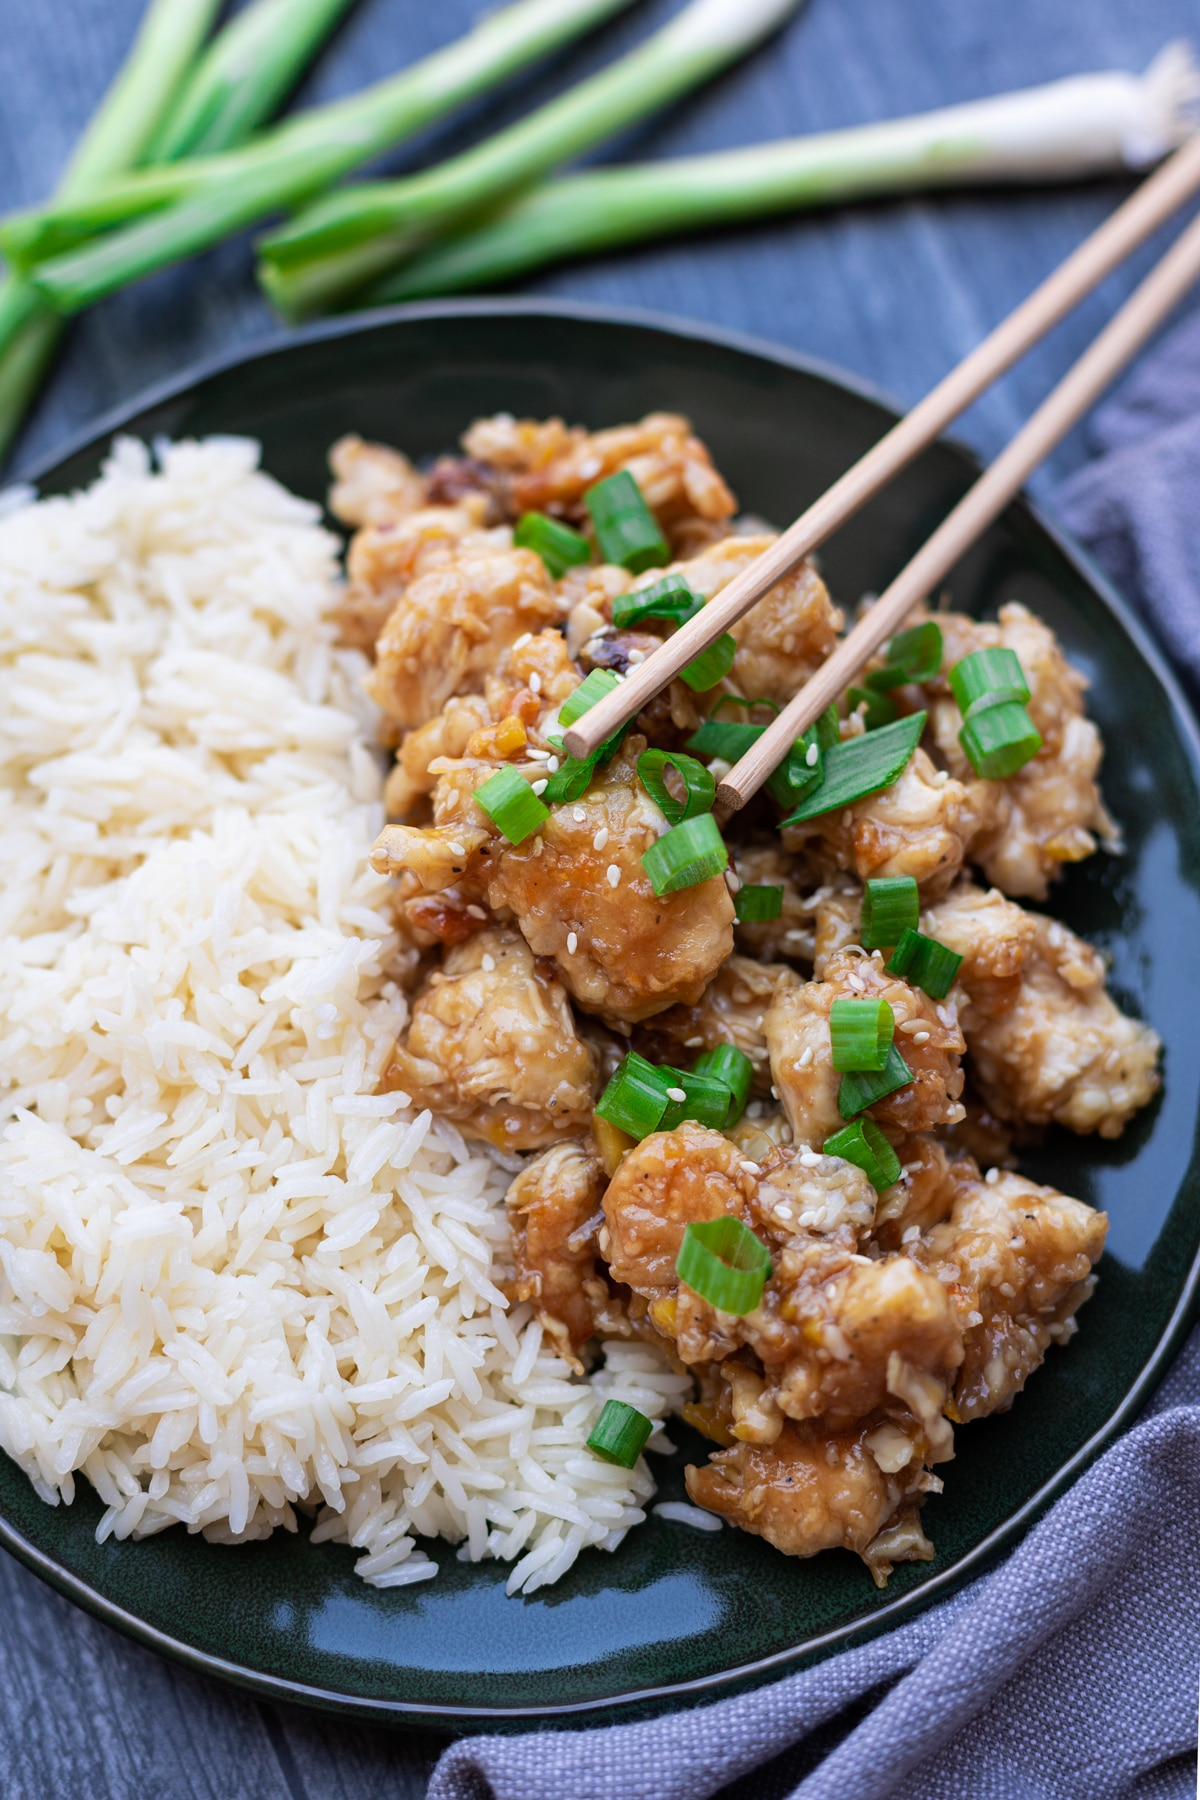 Sesame chicken on a plate with rice, chopsticks on chicken.